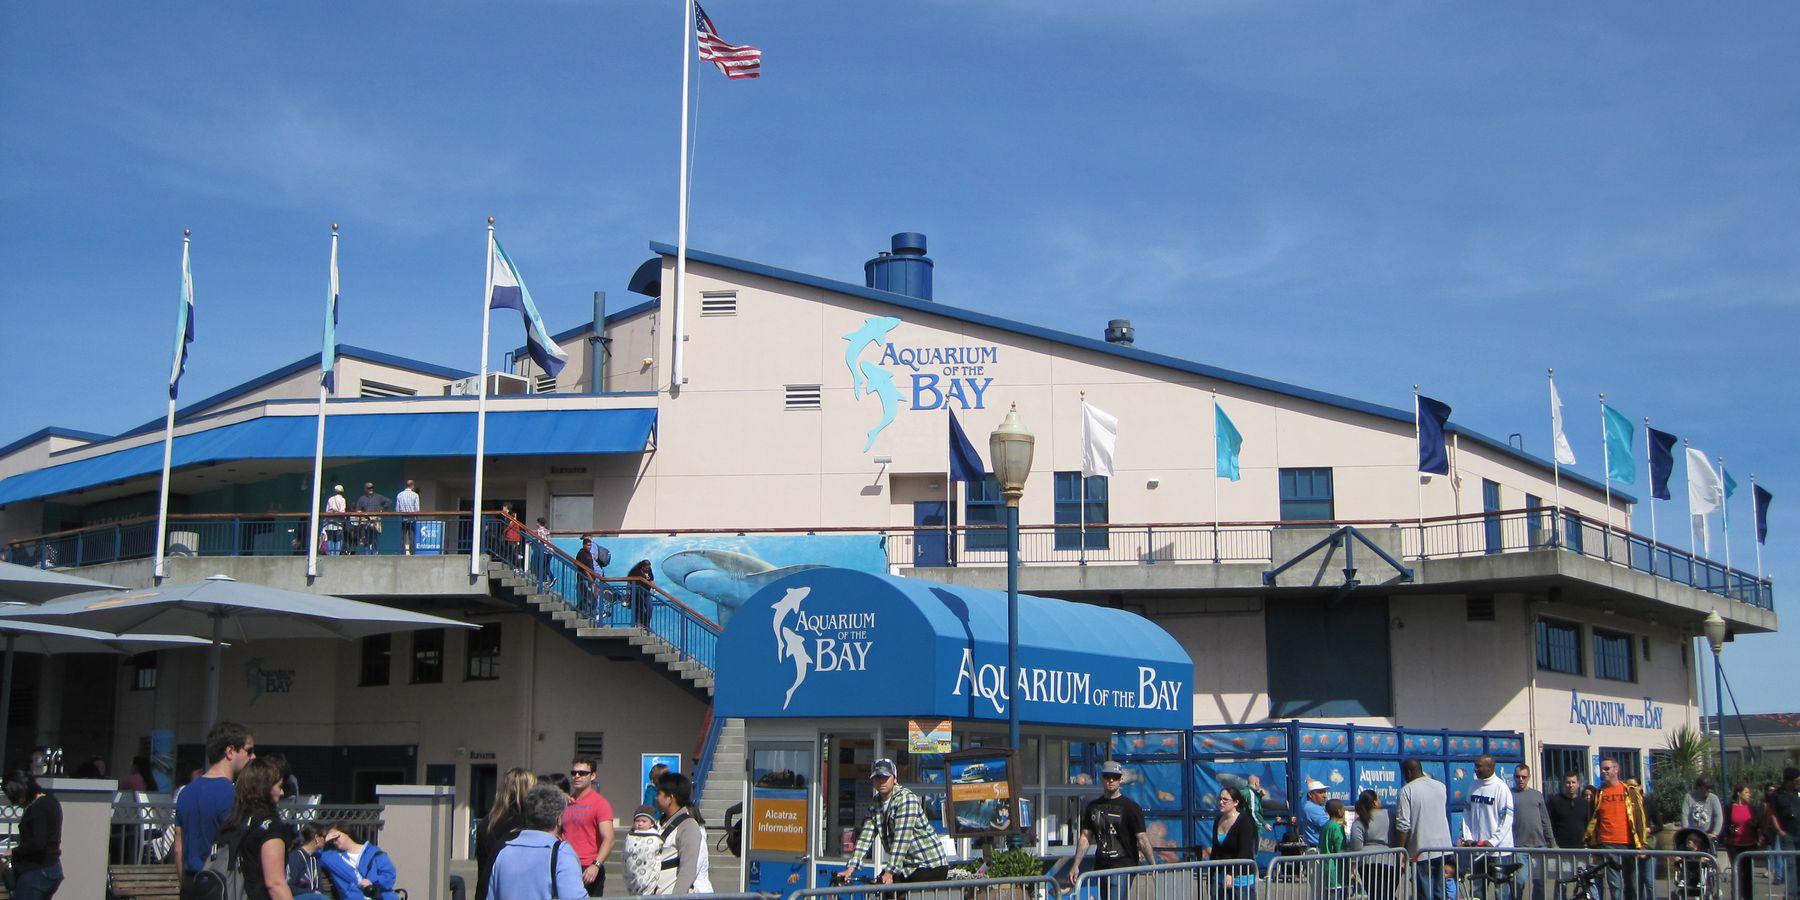 Aquarium of the Bay - San Francisco - California - Amerika - Doets Reizen